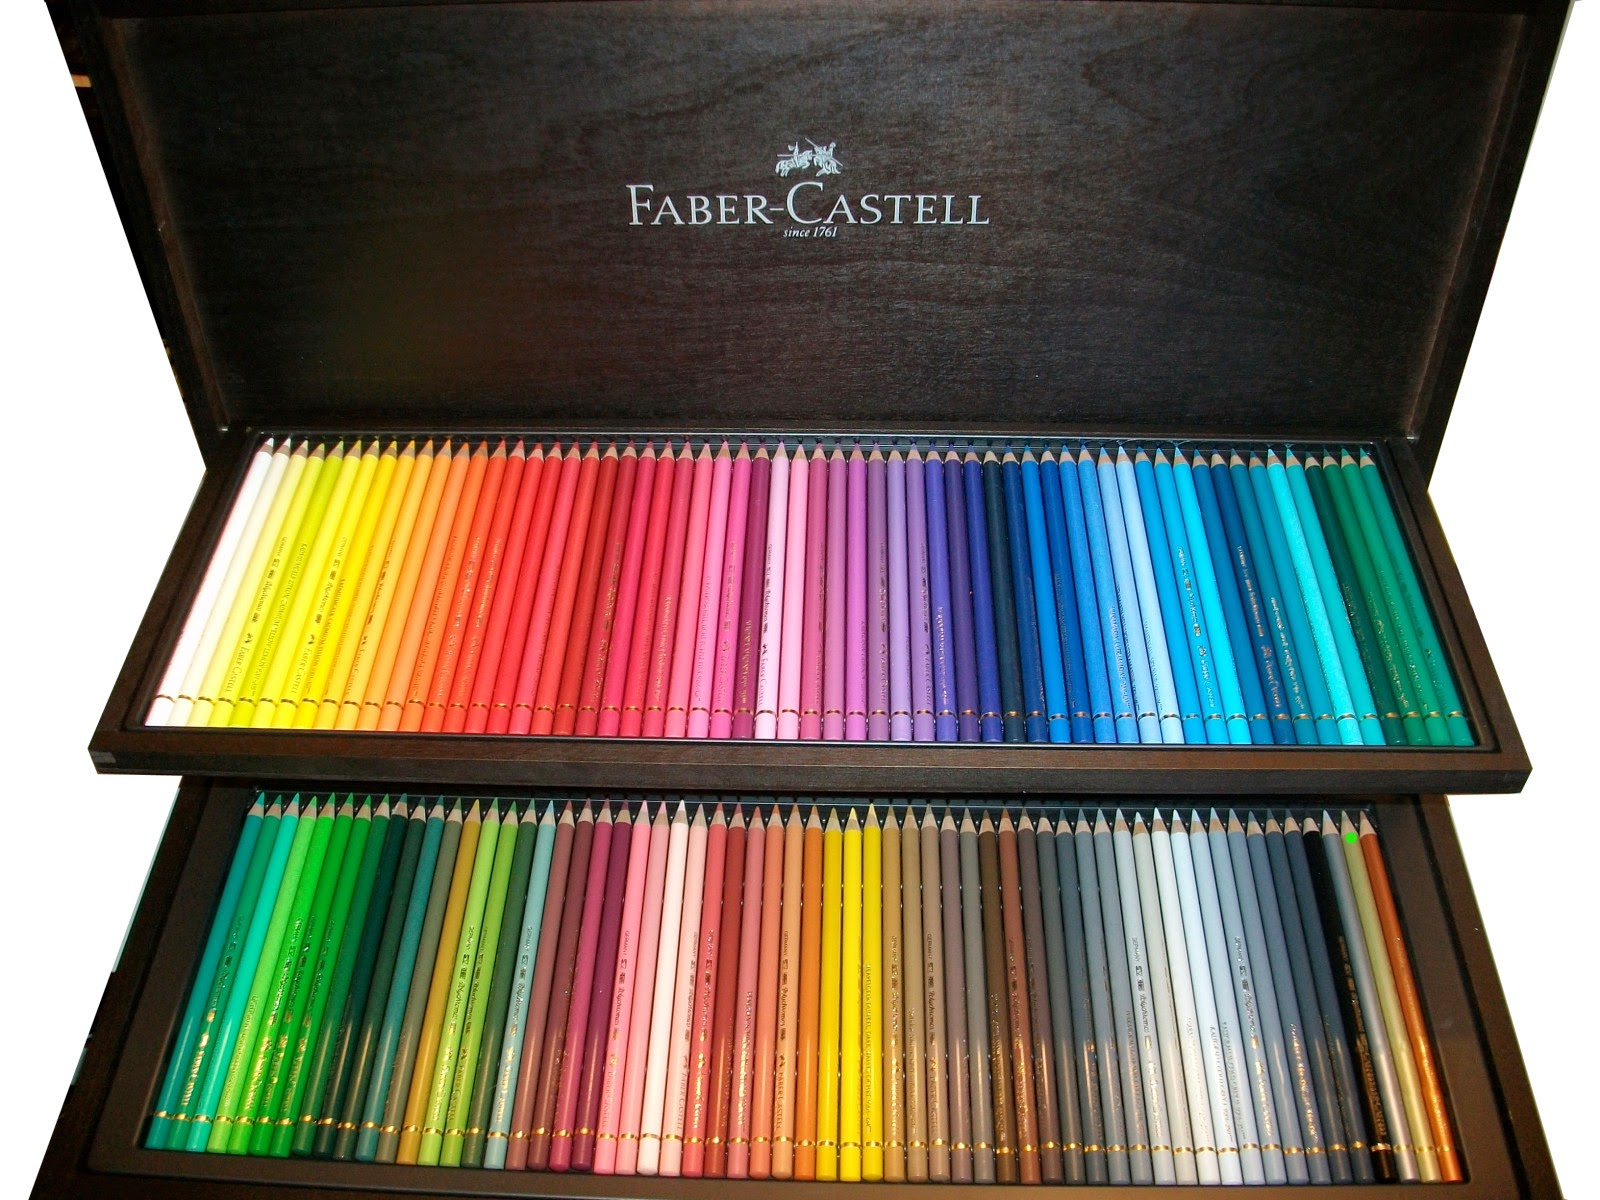 tuto dessin dessin aux crayons de couleur tuto dessin. Black Bedroom Furniture Sets. Home Design Ideas